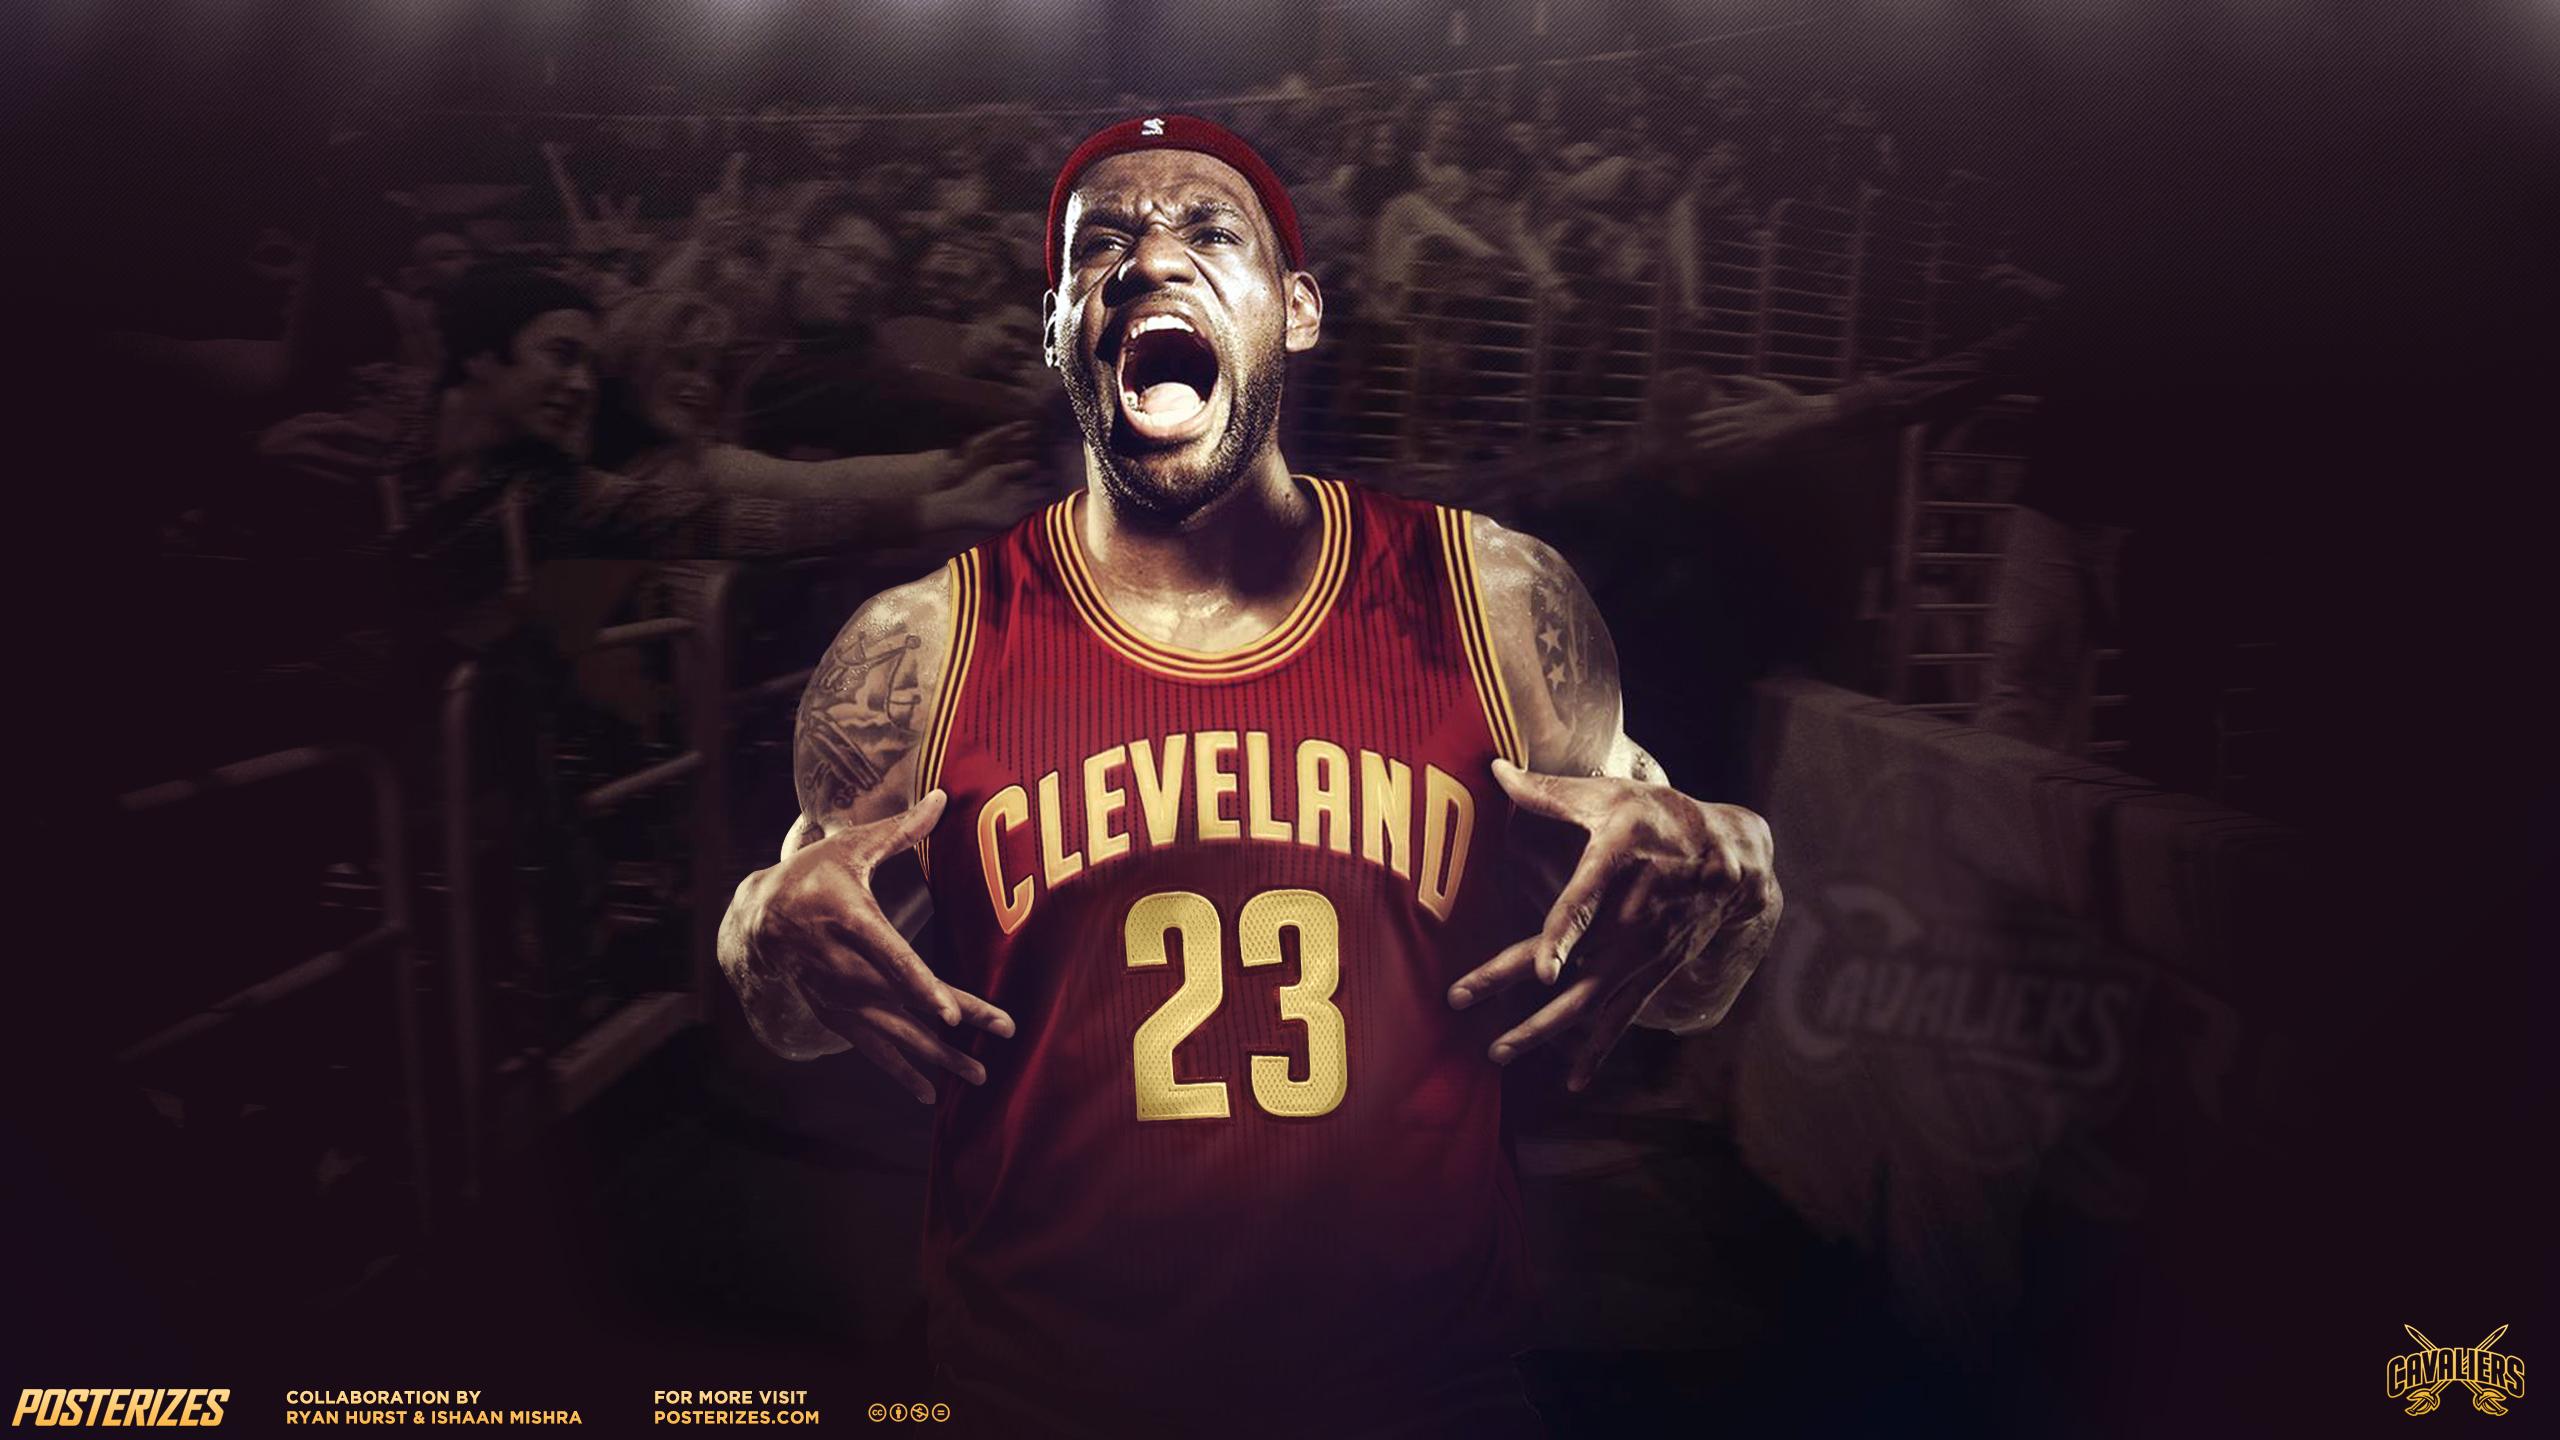 LeBron James Cavs Wallpaper by IshaanMishra 2560x1440